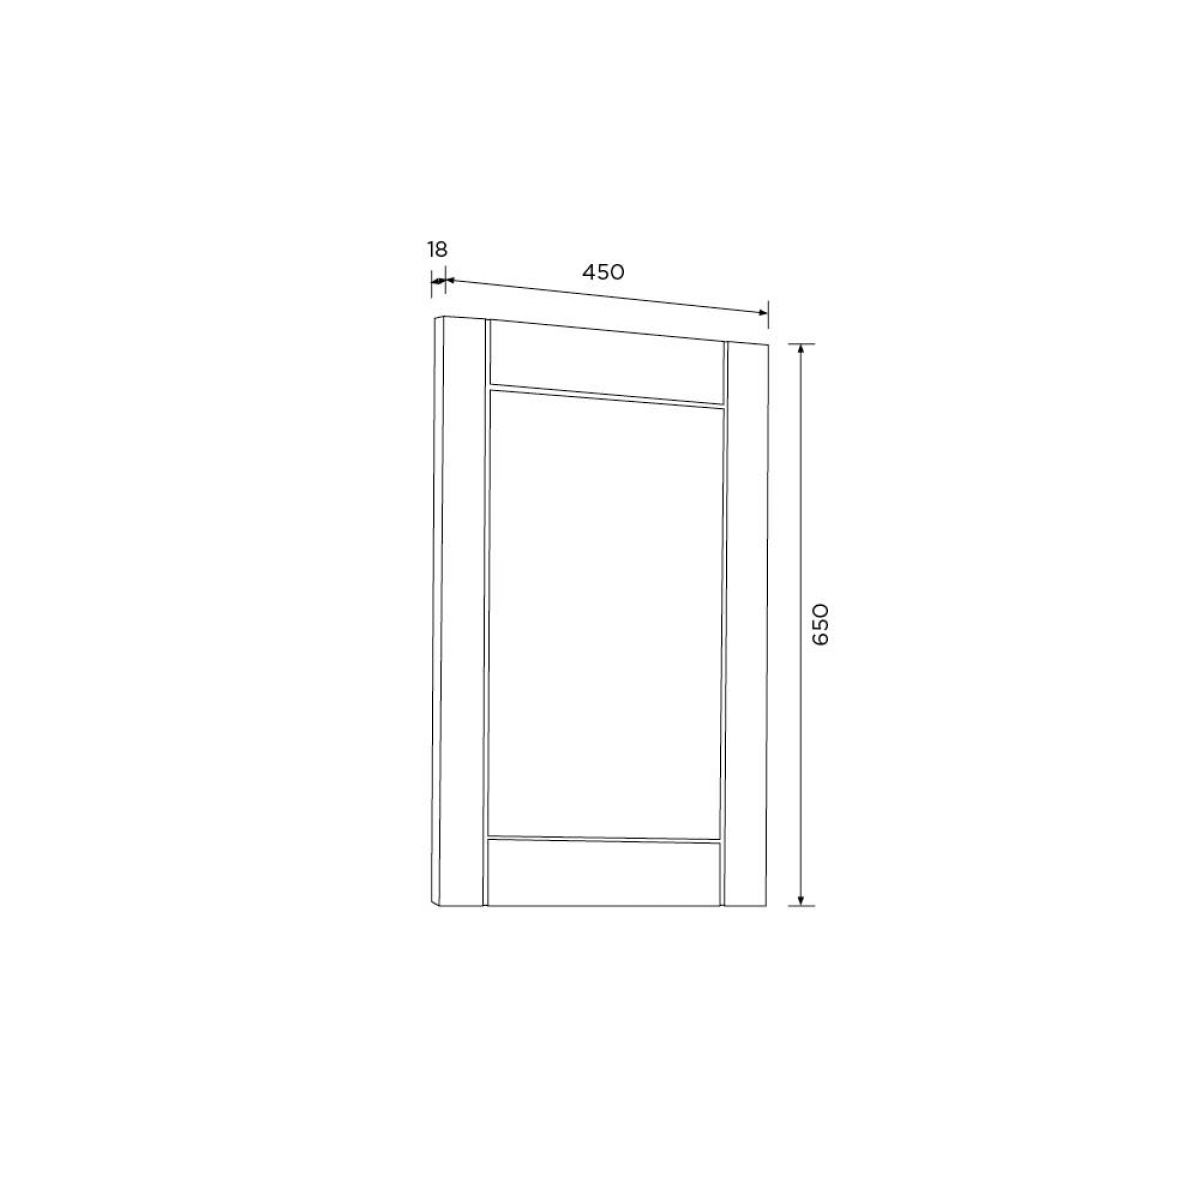 Elation Sendai White Gloss Framed Mirror 450mm Measurements